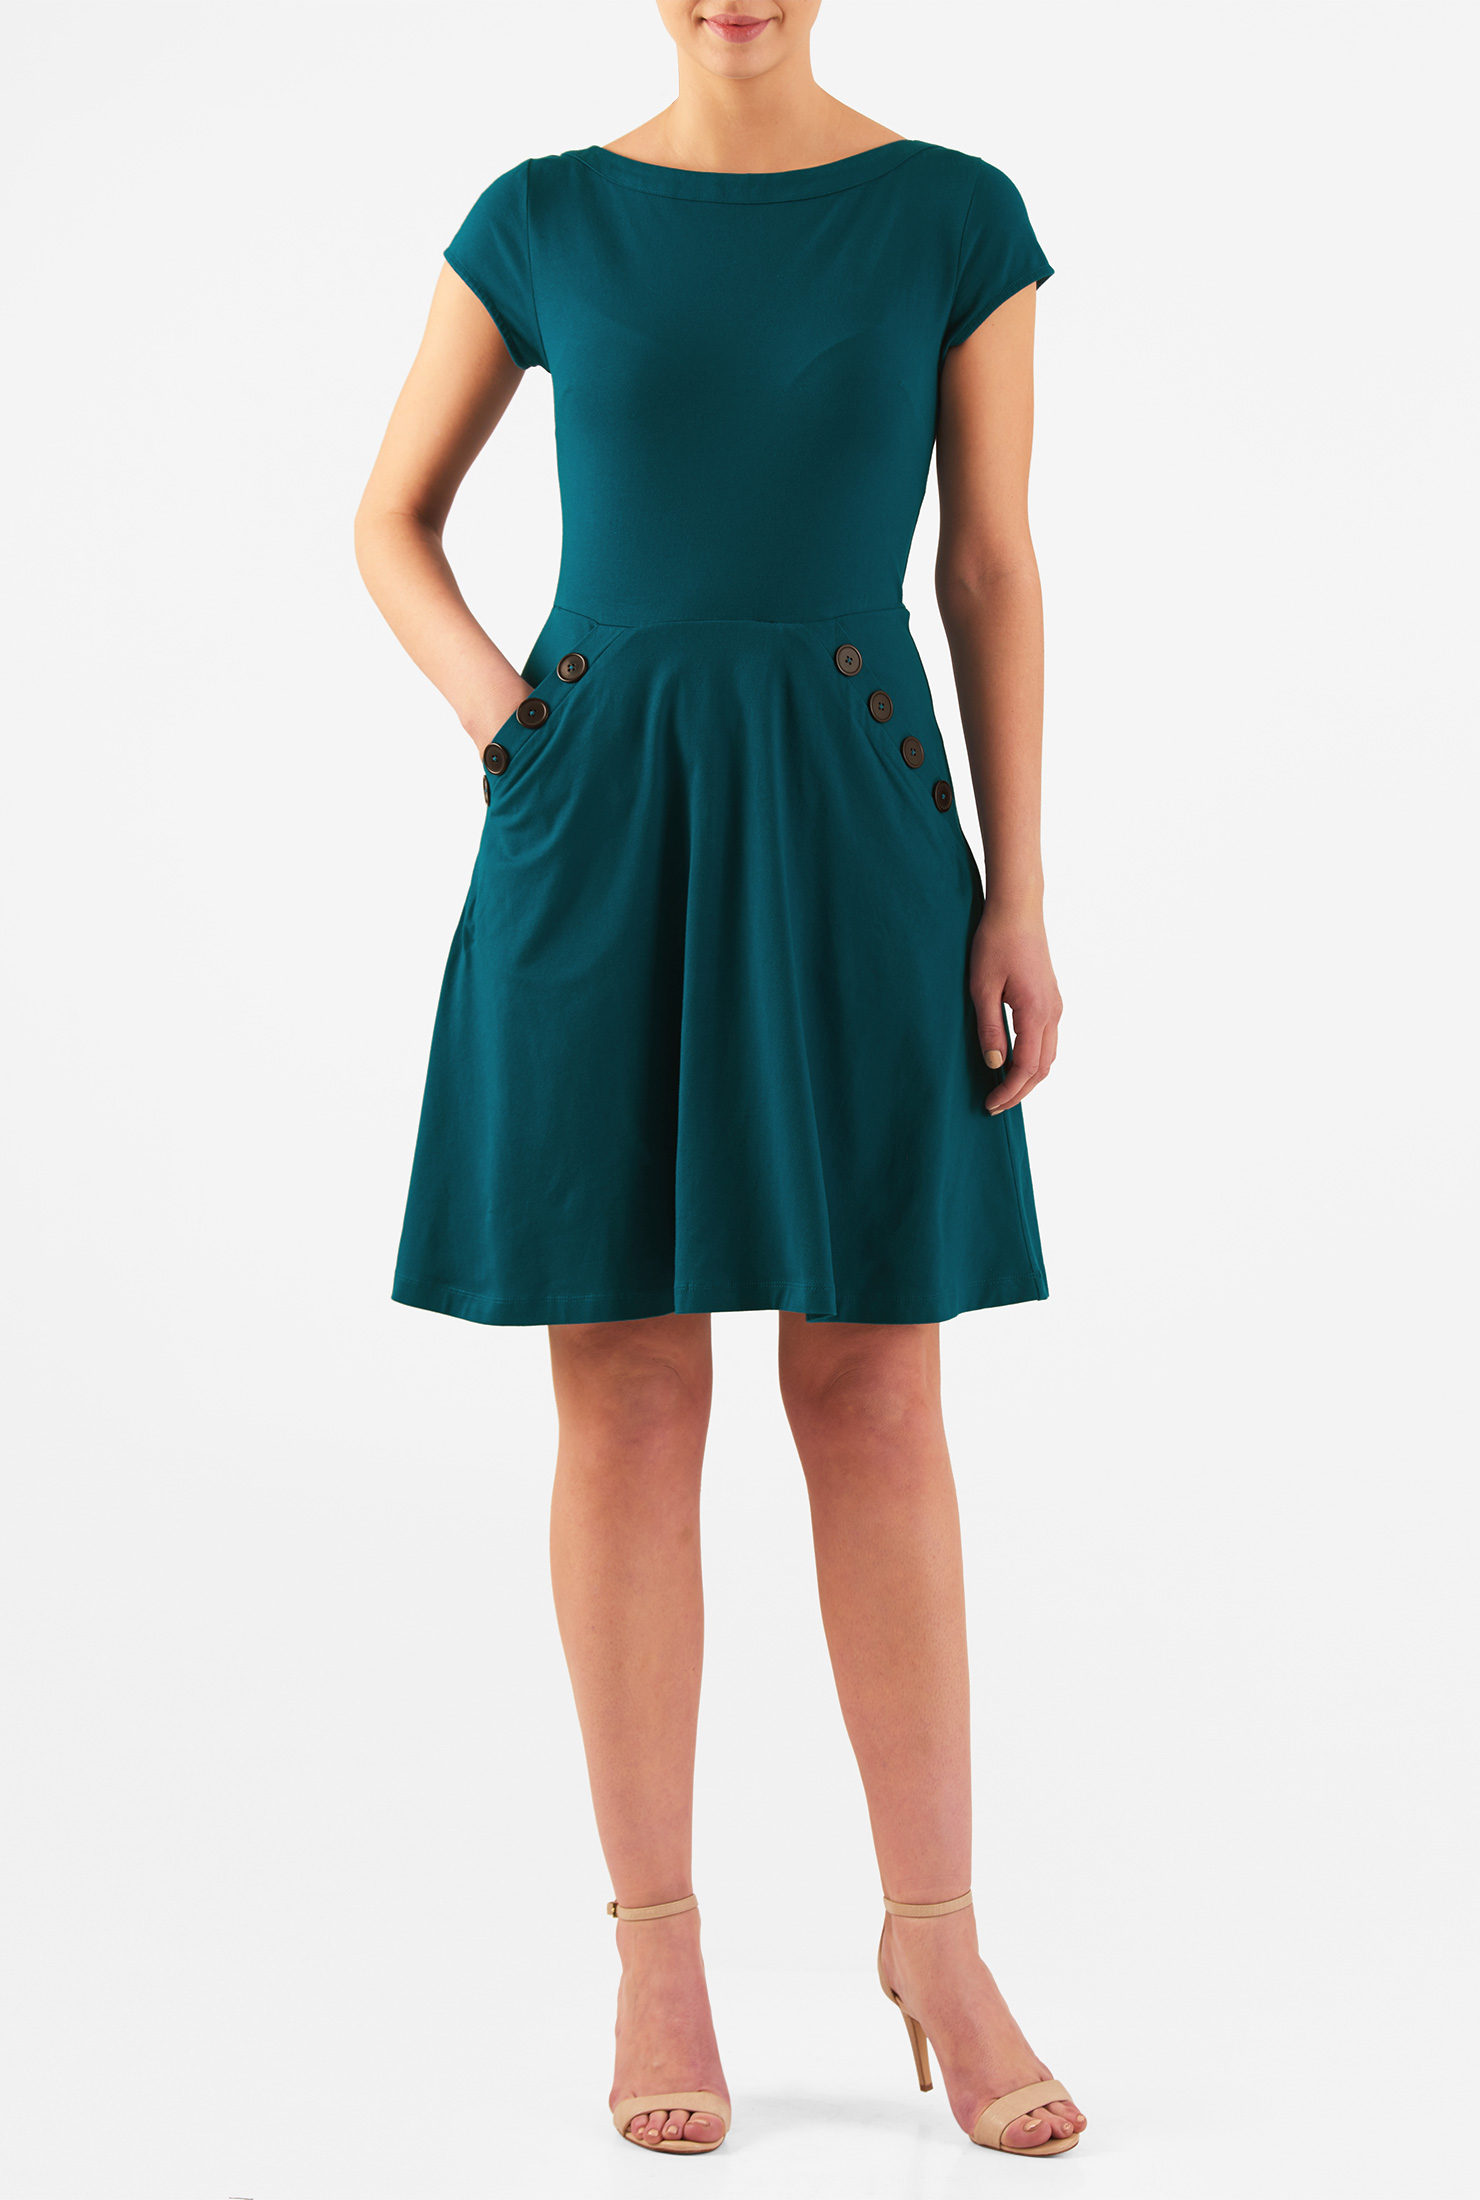 Eshakti Womens Large Button Pocket Knit Dress